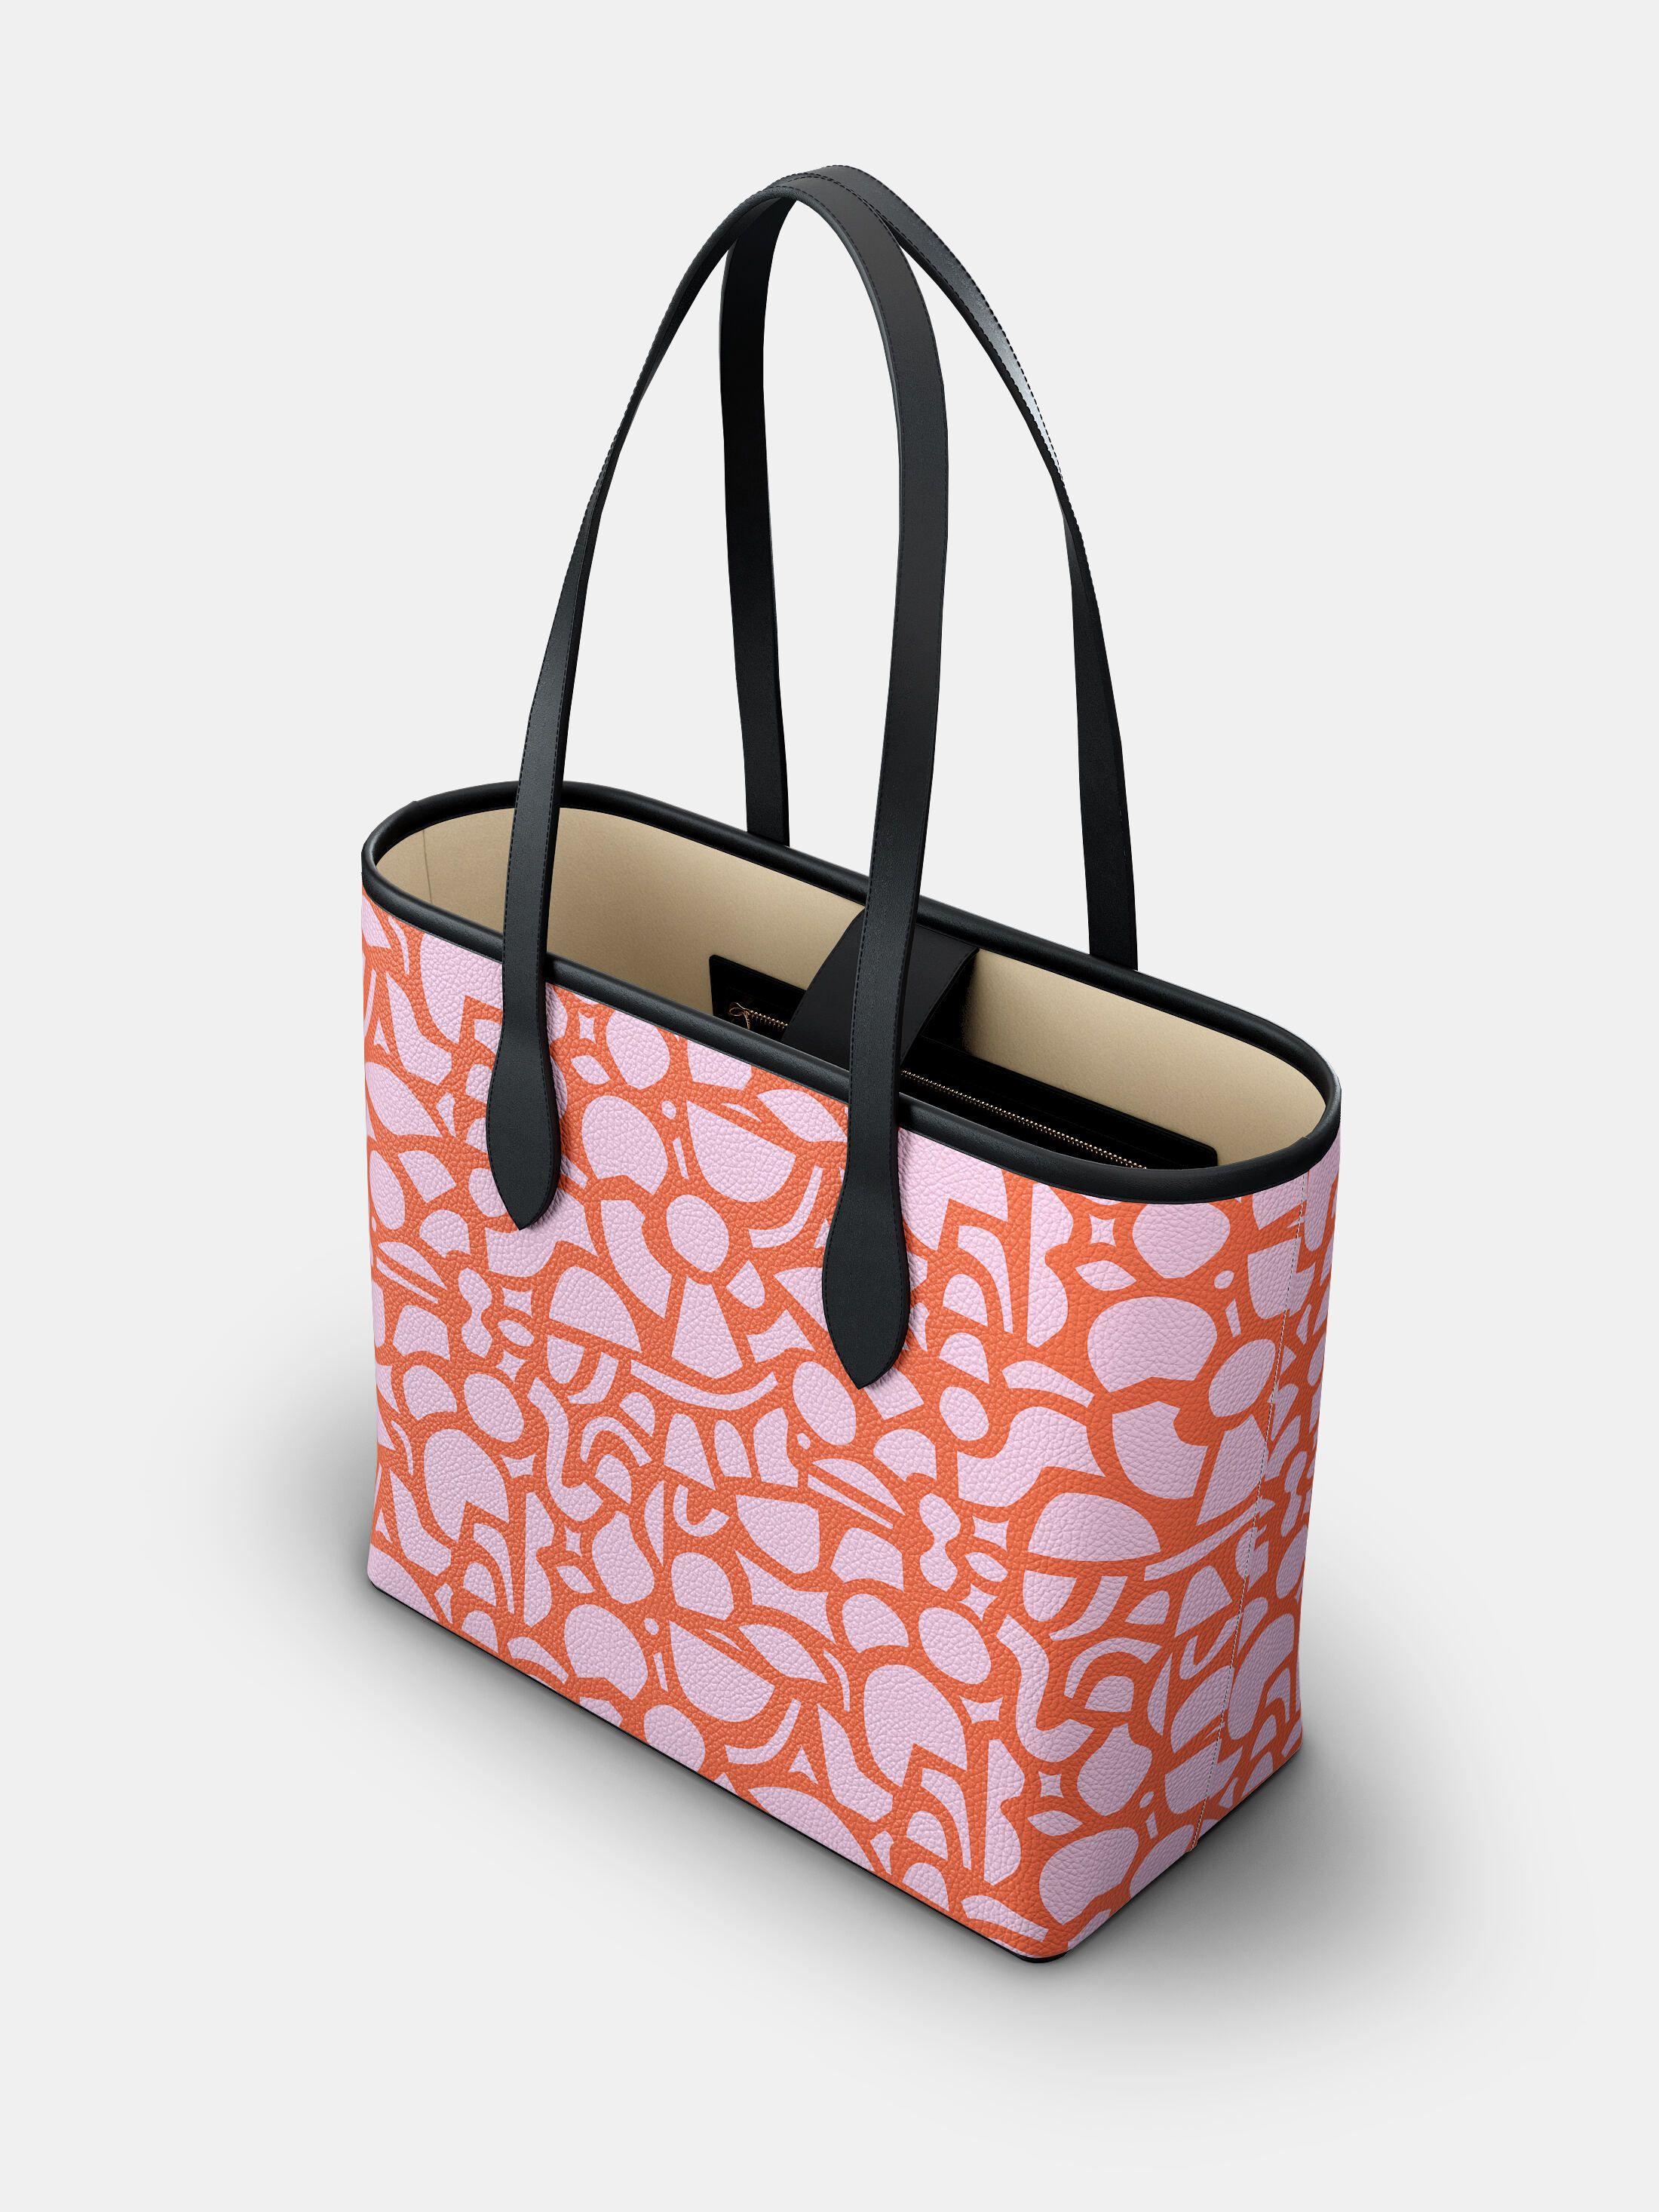 Customizable City Tote Bag